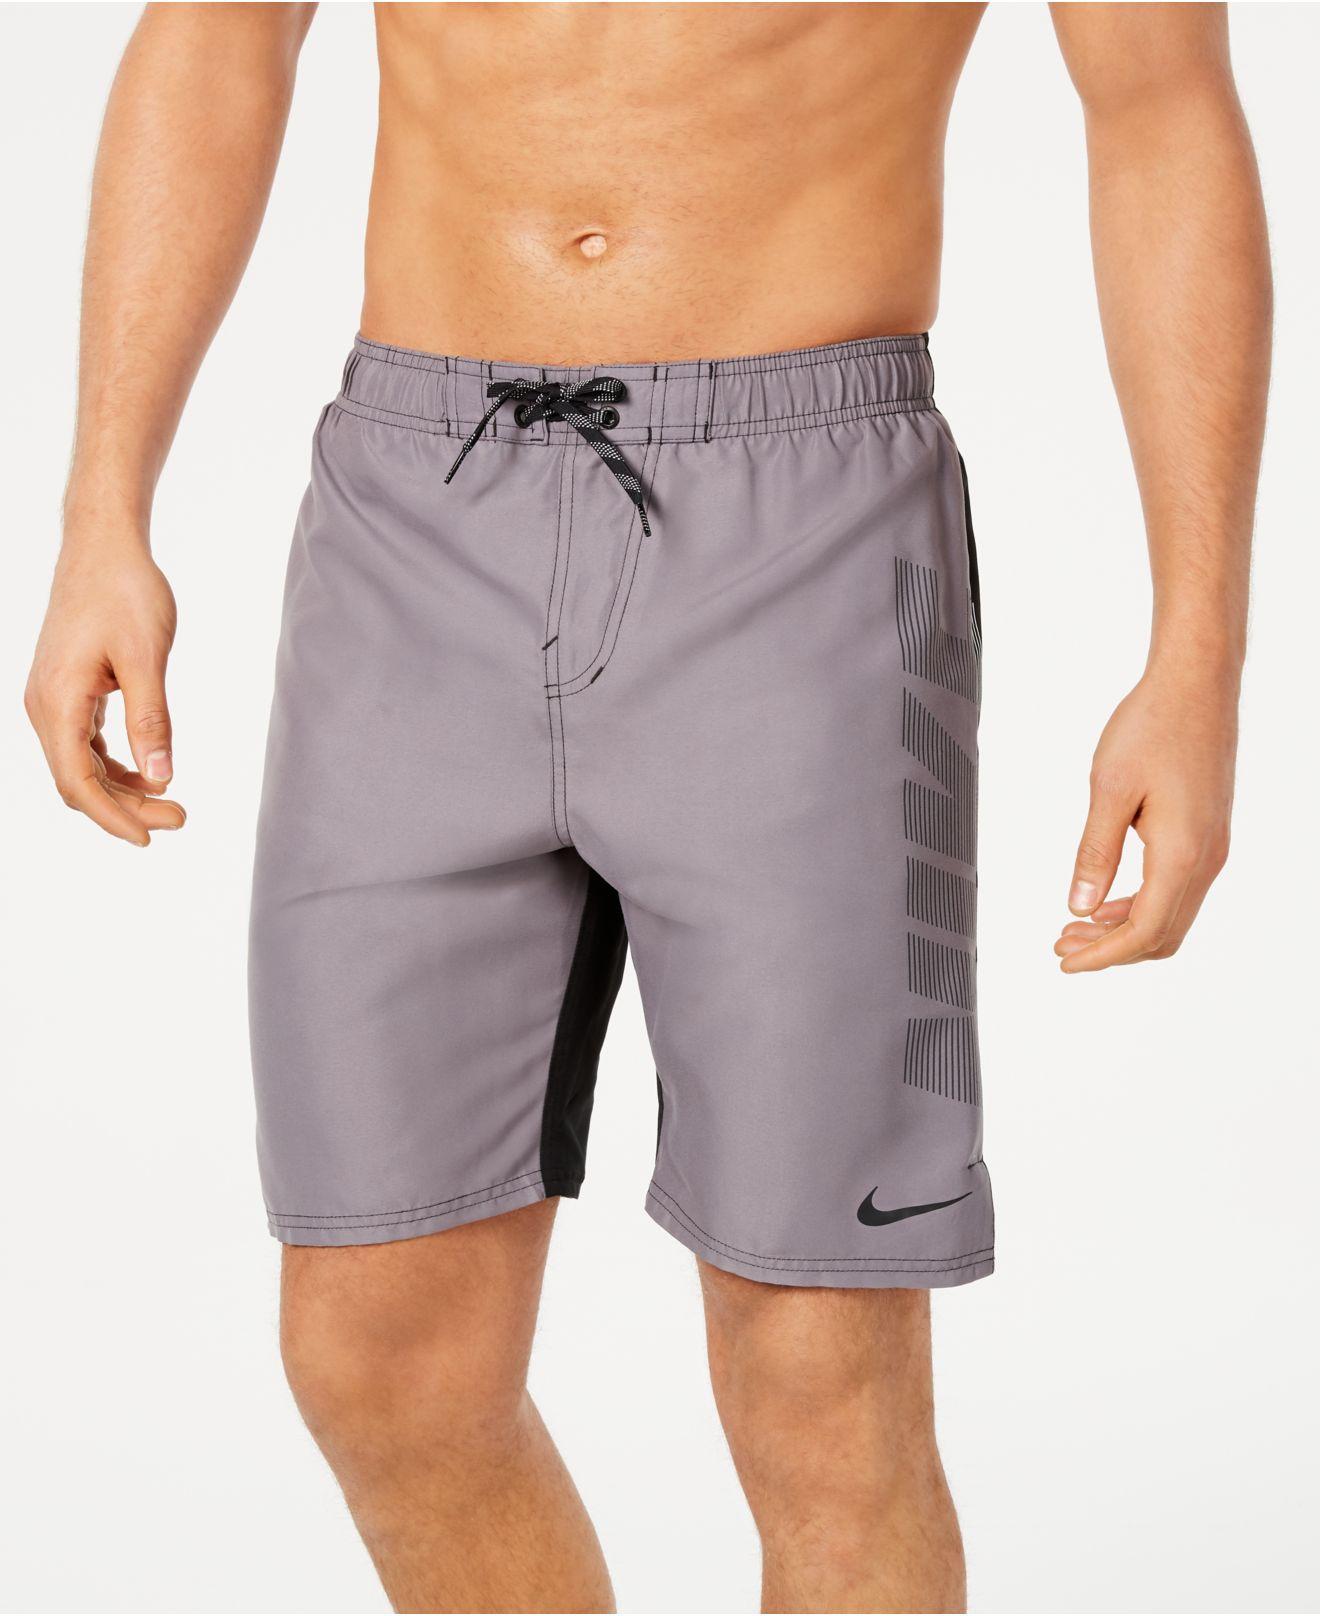 719739338d7ed Lyst nike rift vital regular fit quick dry jpg 1320x1616 Macys nike boy  shorts swimwear